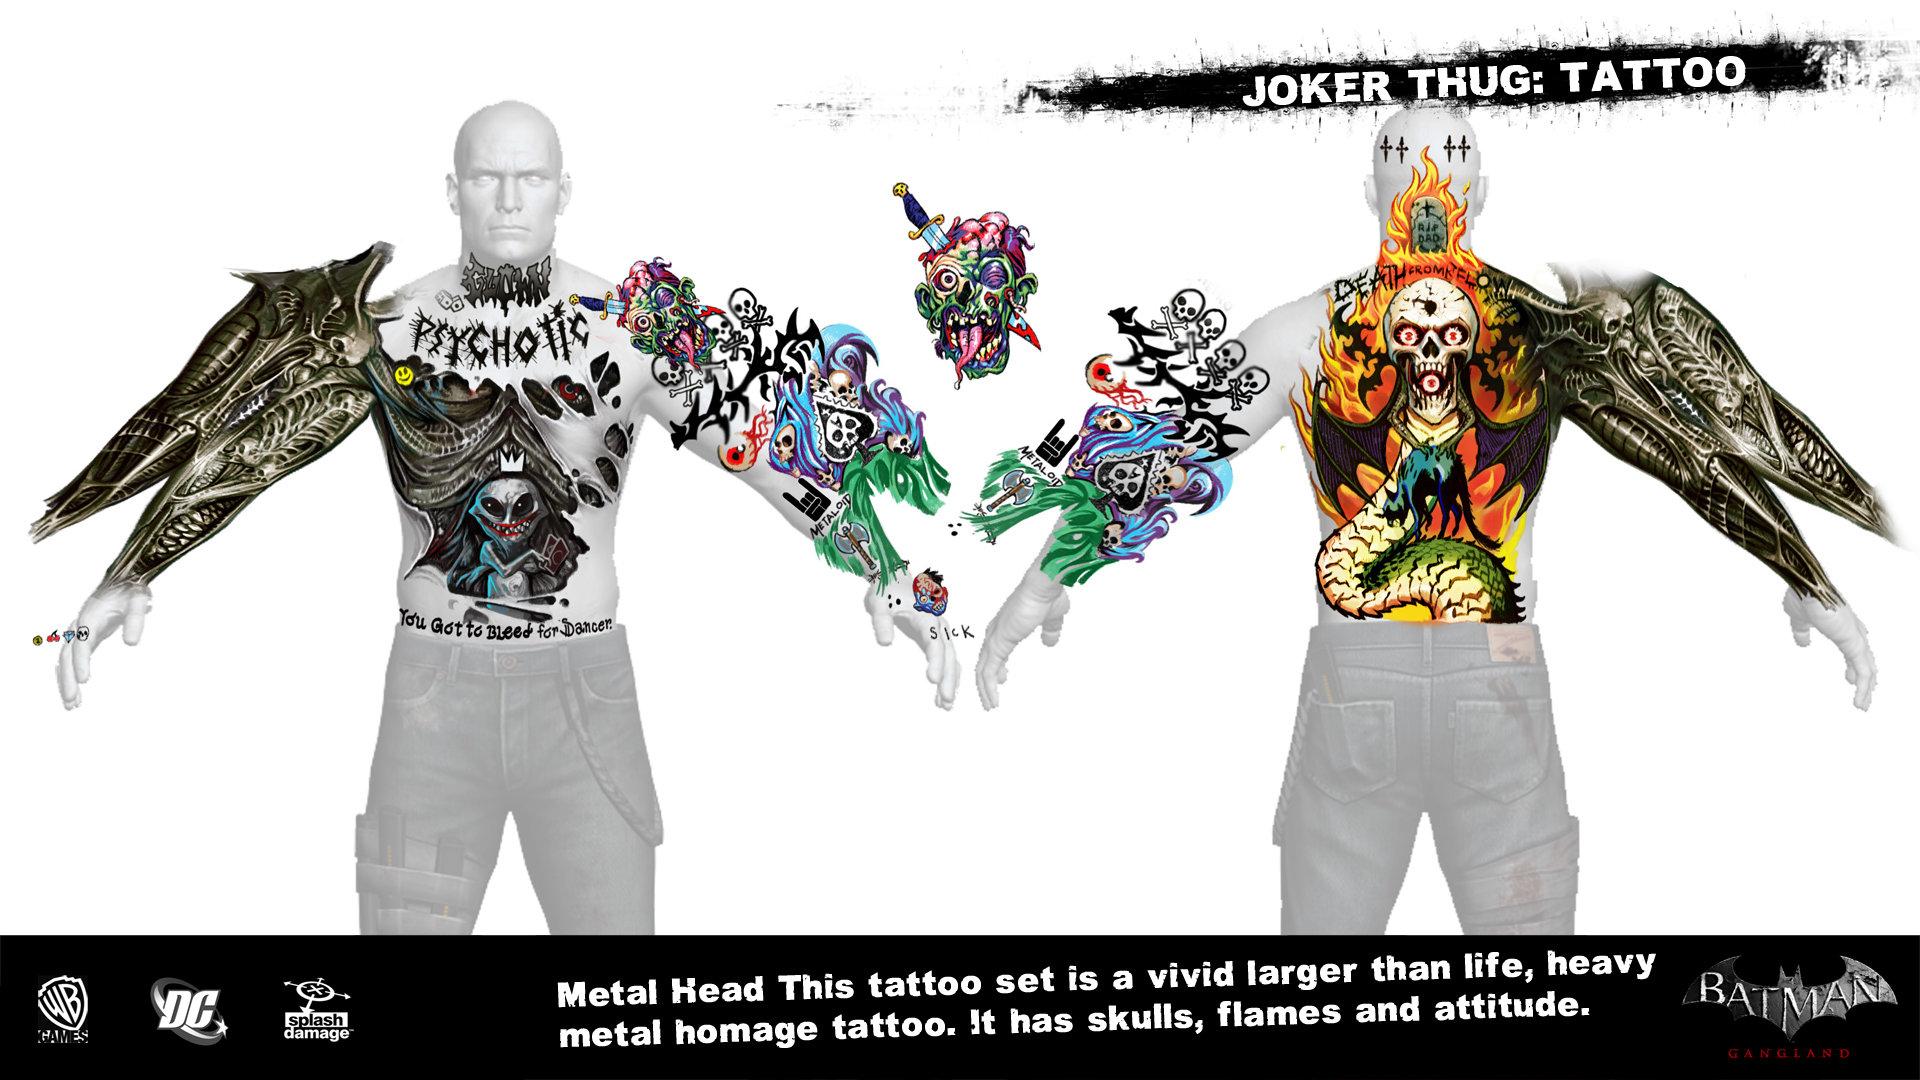 Manuel augusto dischinger moura splashdamage joker thug tattoo 3